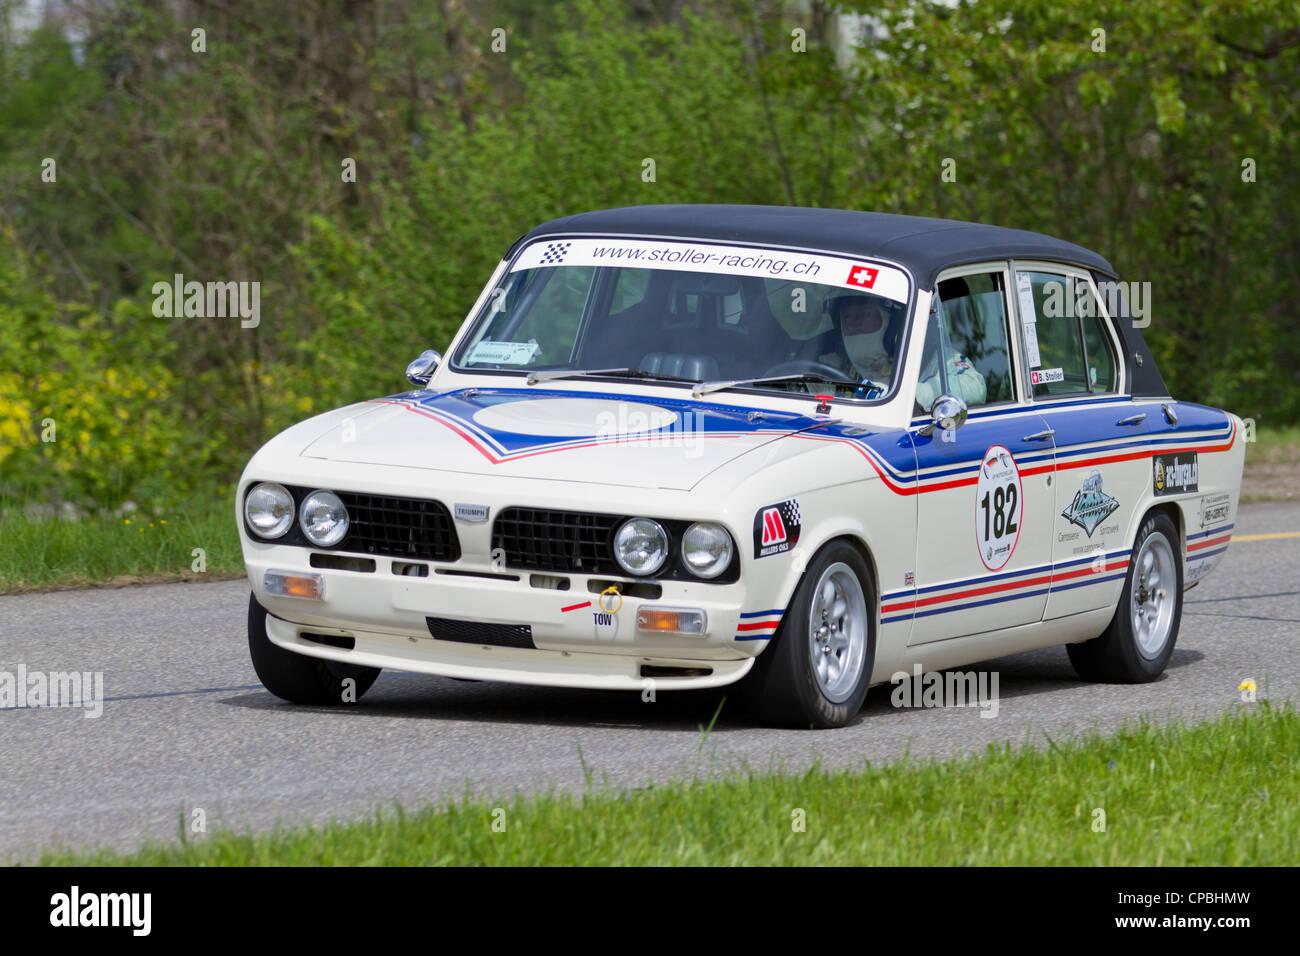 2019 Latest Design Vintage Triumph Dolomite Car Badge Car Badges